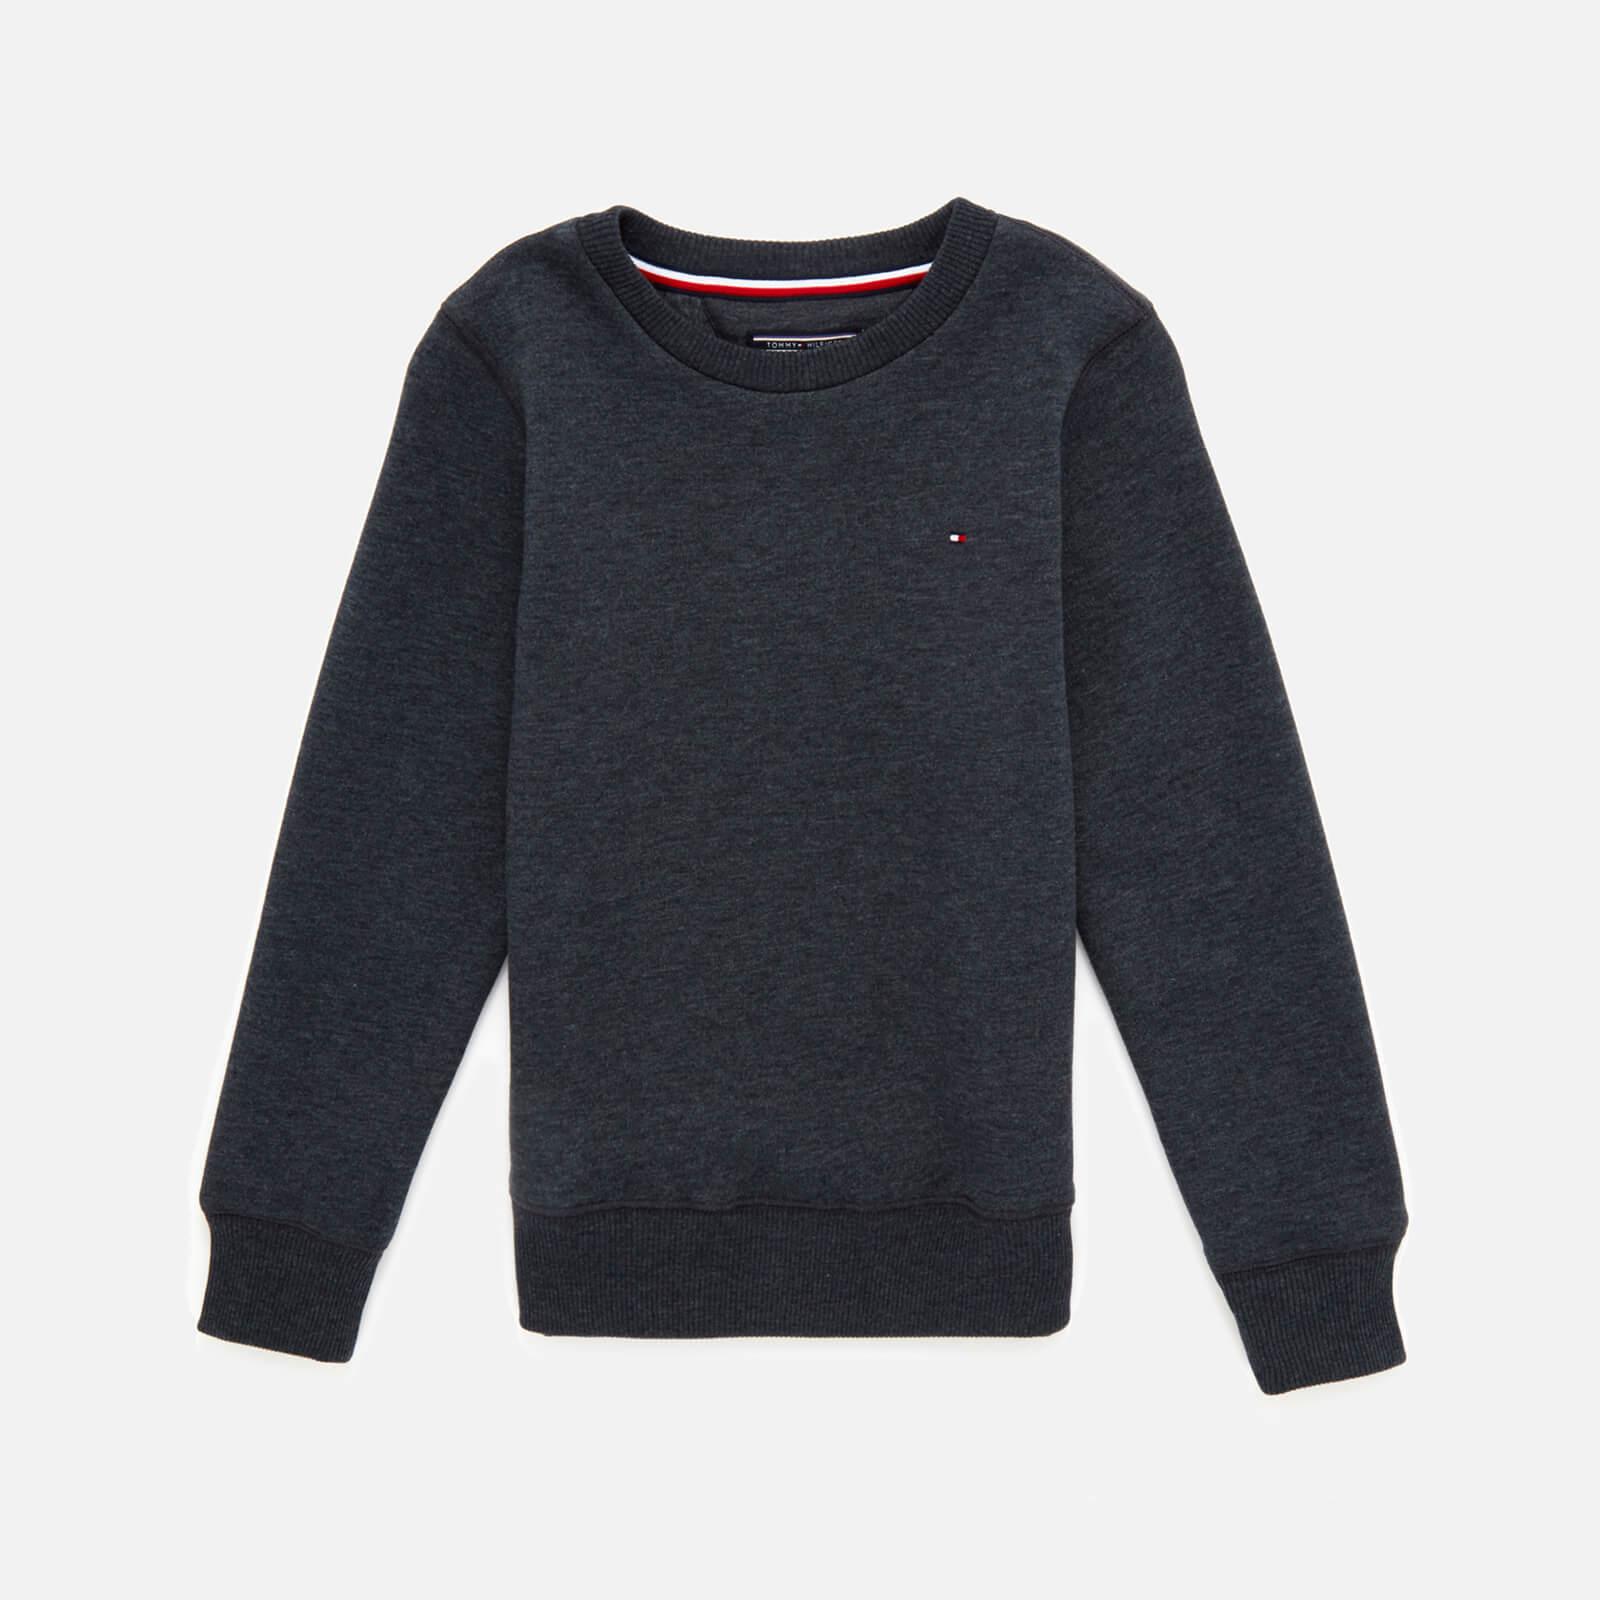 Tommy Kids Boys' Basic Sweatshirt - Sky Captain - 8 Years